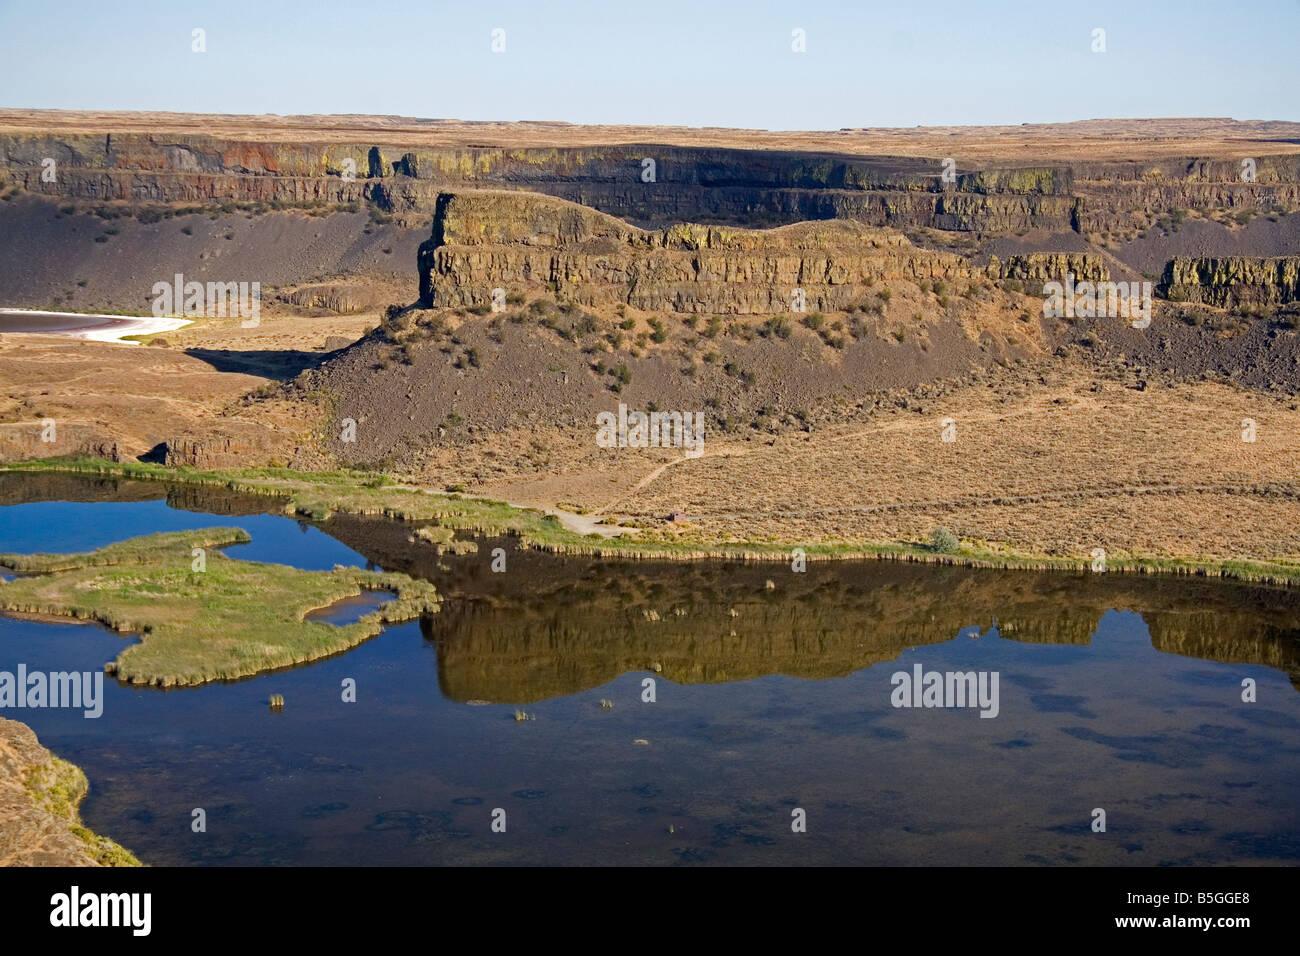 Dry Falls near Coulee City Washington - Stock Image